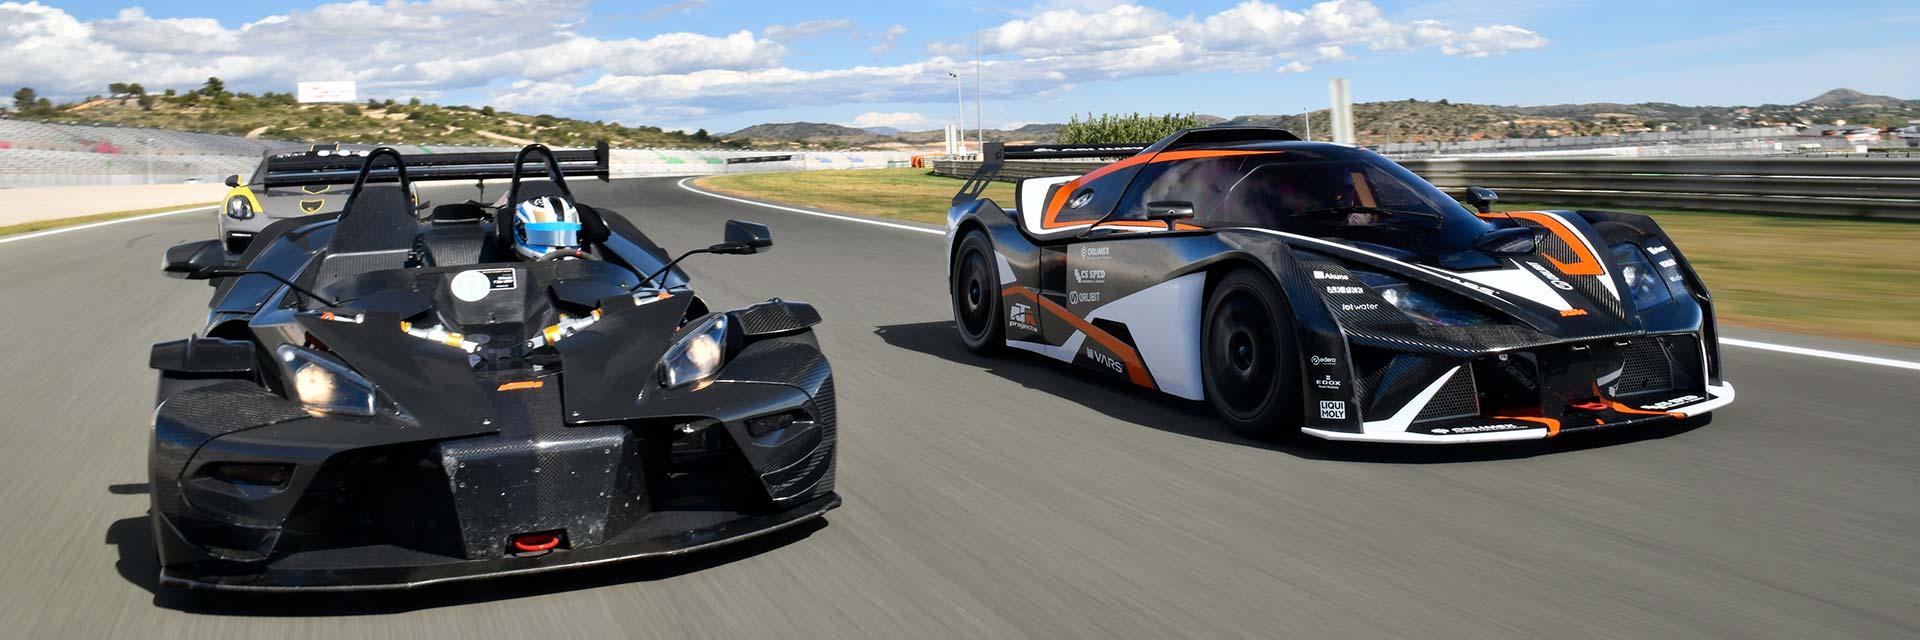 GEDLICH Racing - Racetracks